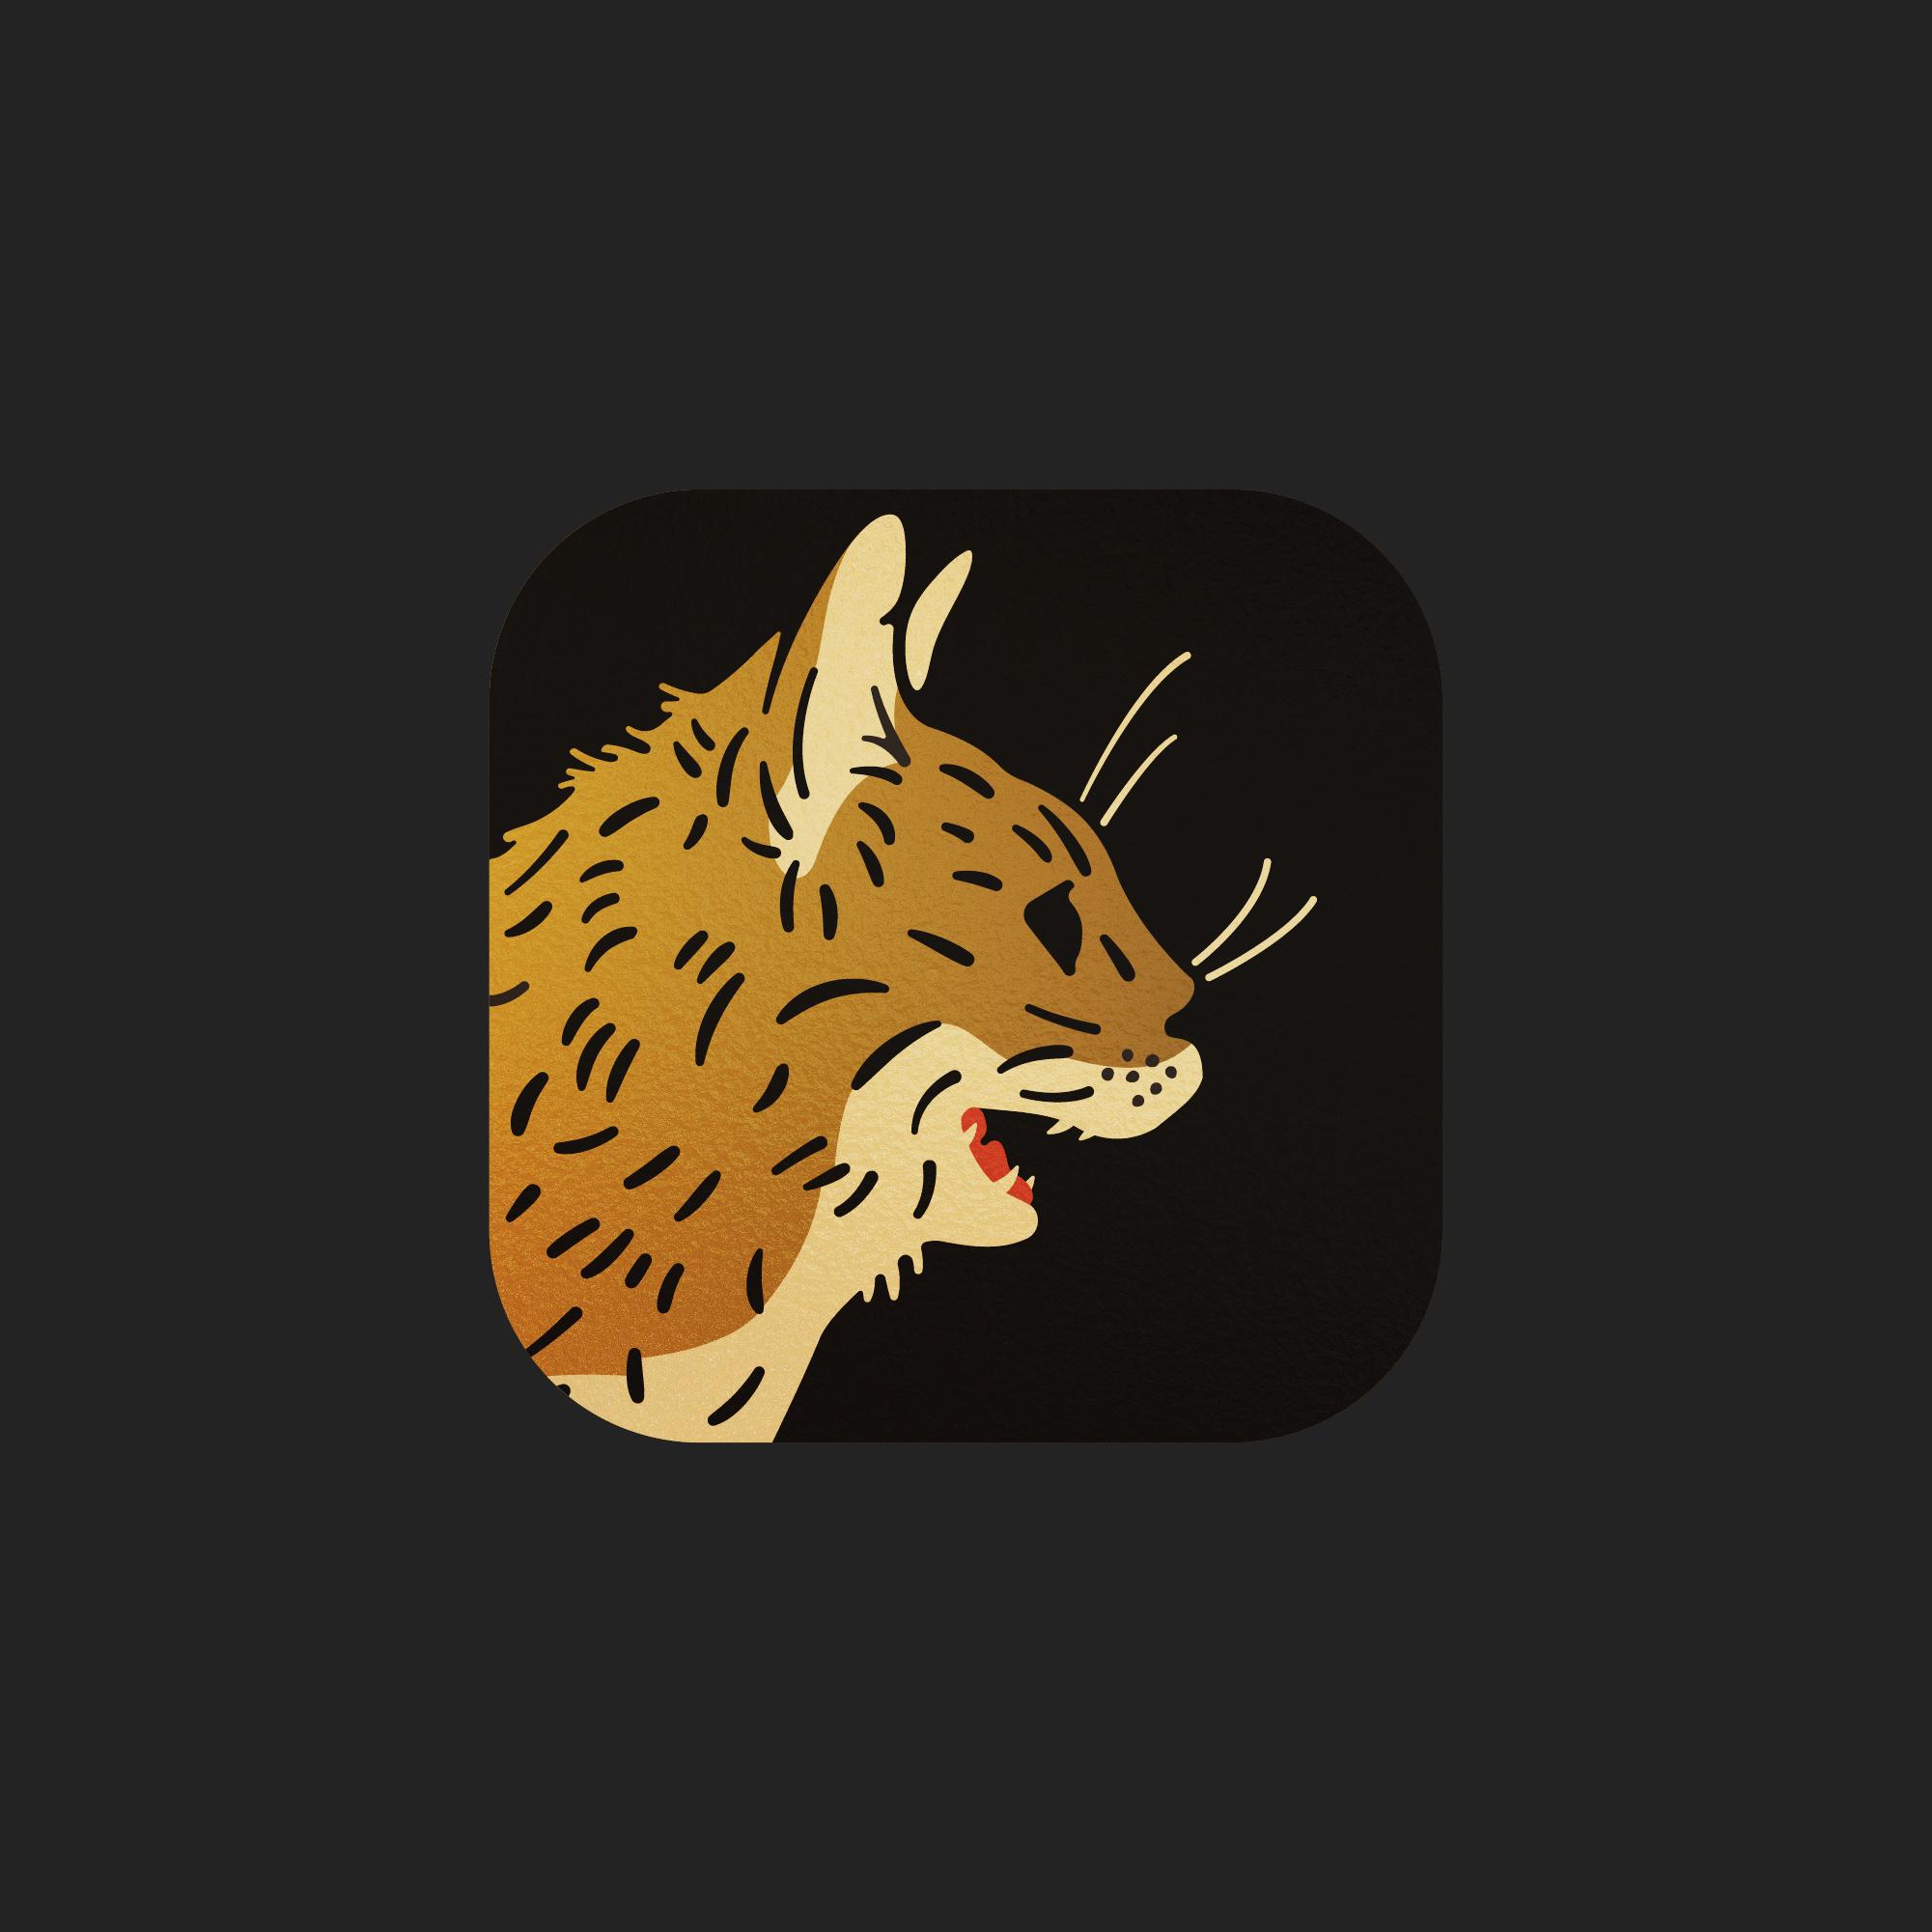 cat-chat_thumb-100.jpg